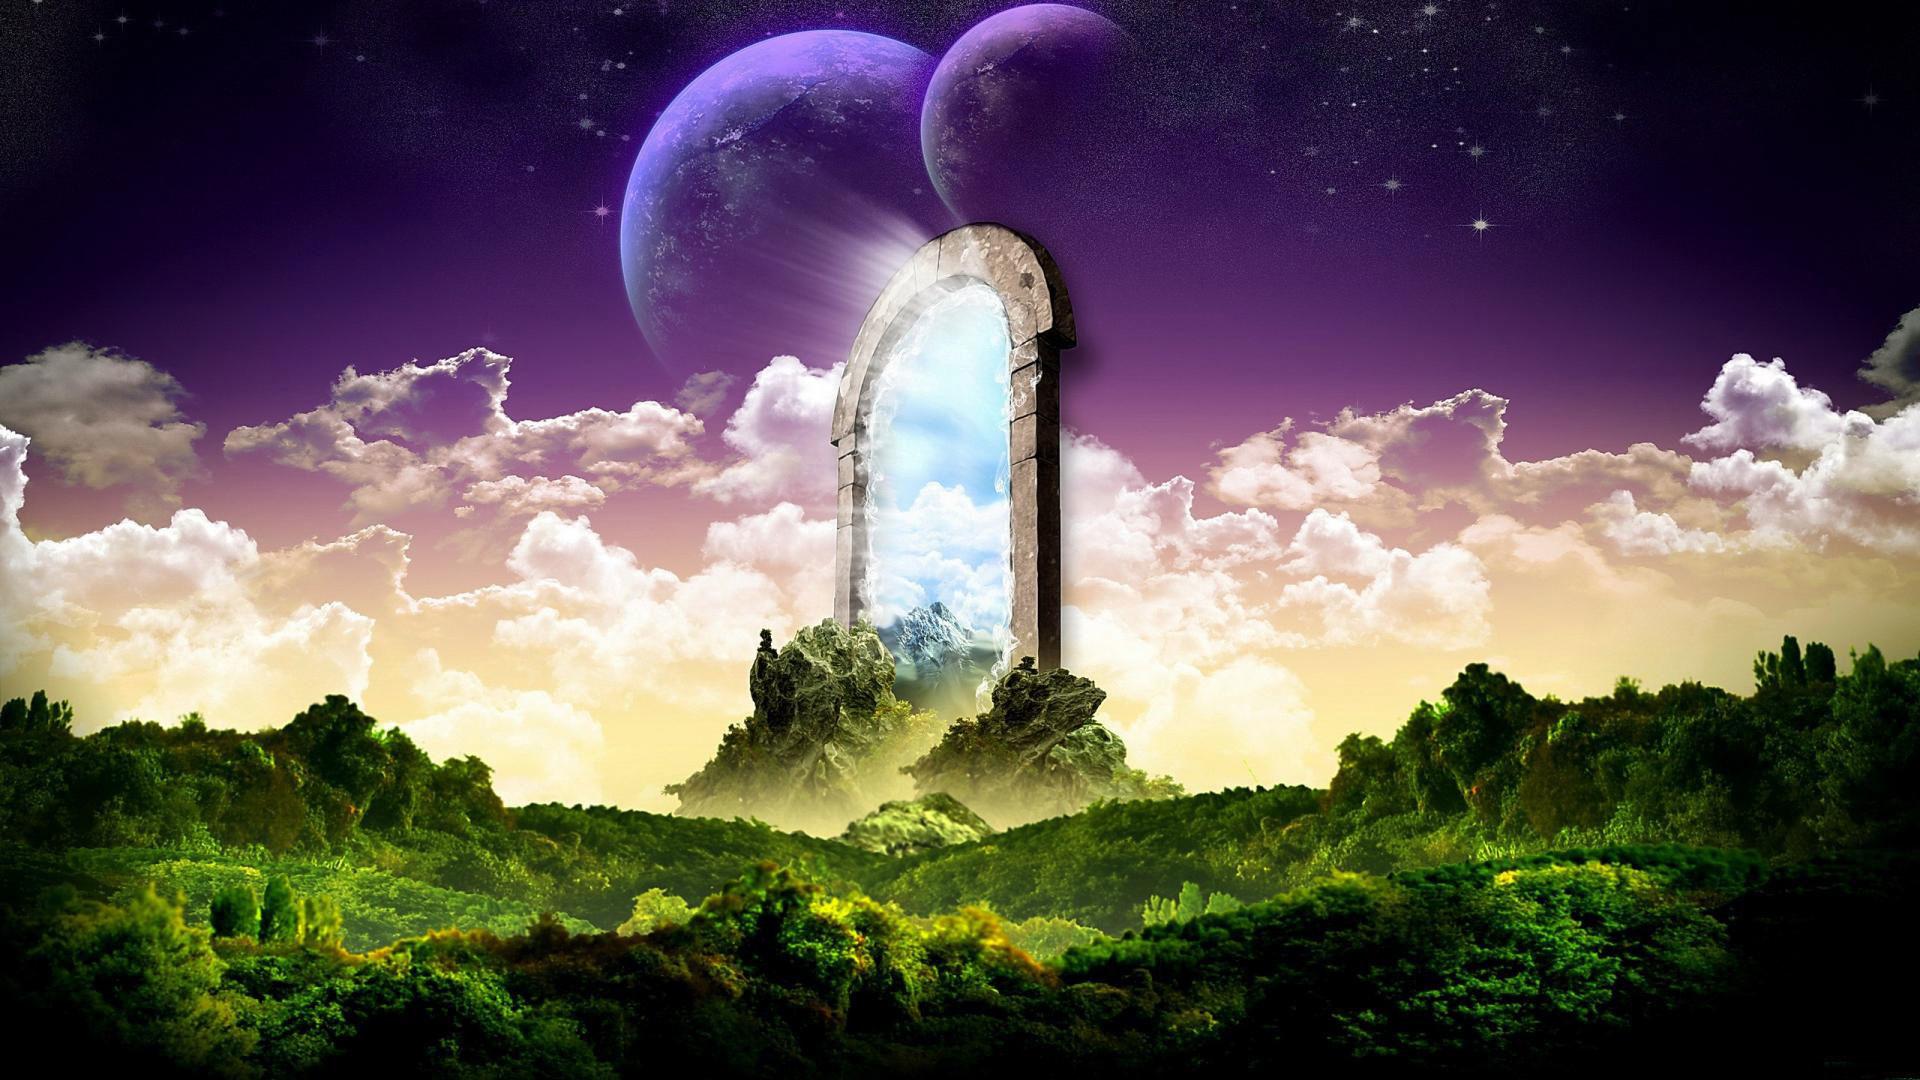 hd pics photos attractive stunning nature heaven planets beautiful hd  quality desktop background wallpaper